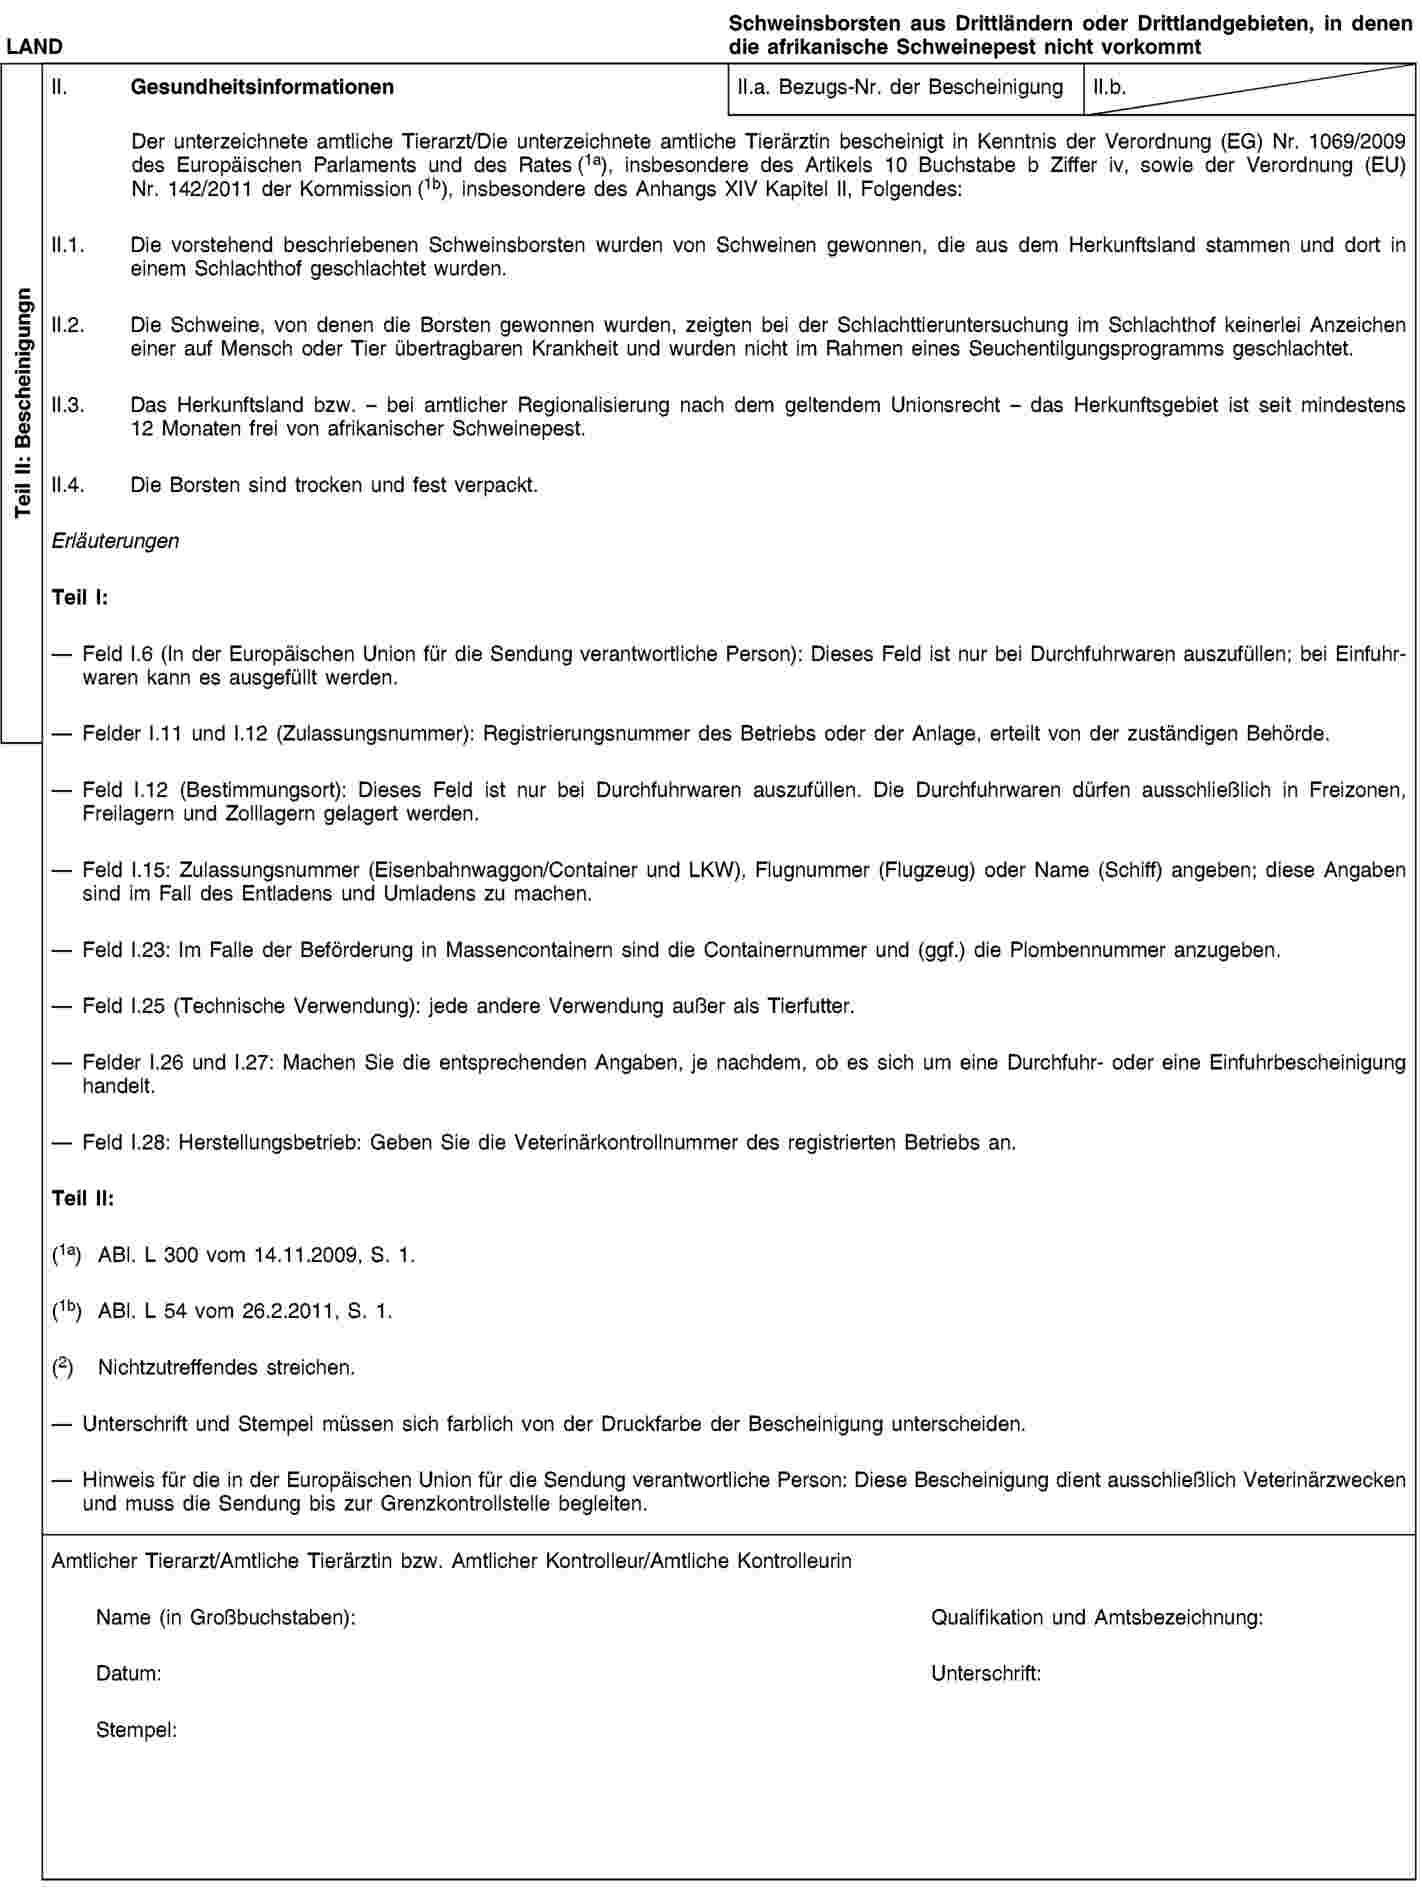 EUR-Lex - 32011R0142 - EN - EUR-Lex